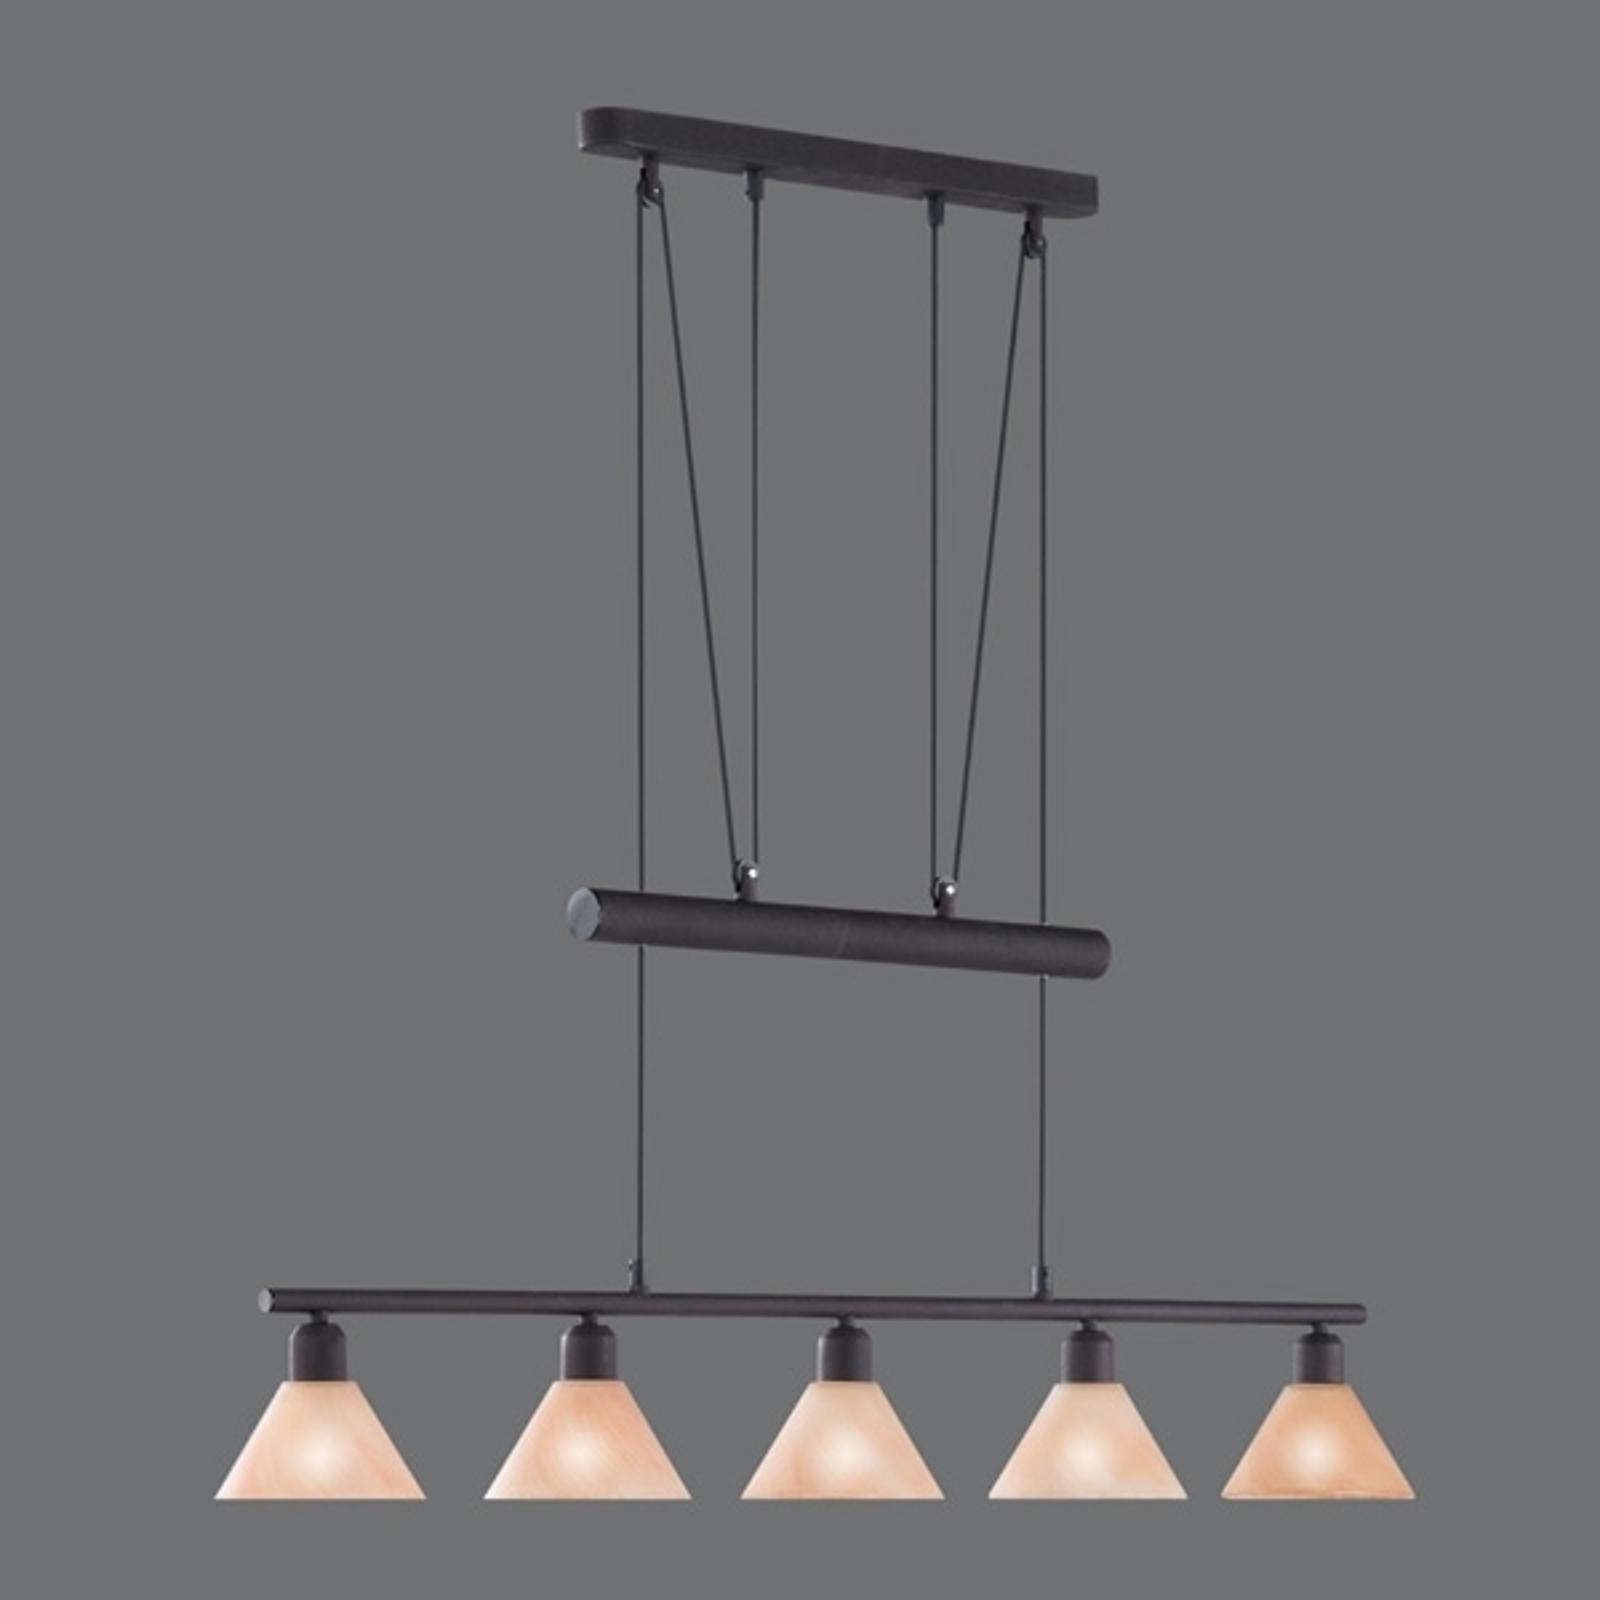 In hoogte verstelbare hanglamp Zug, 5-lichts